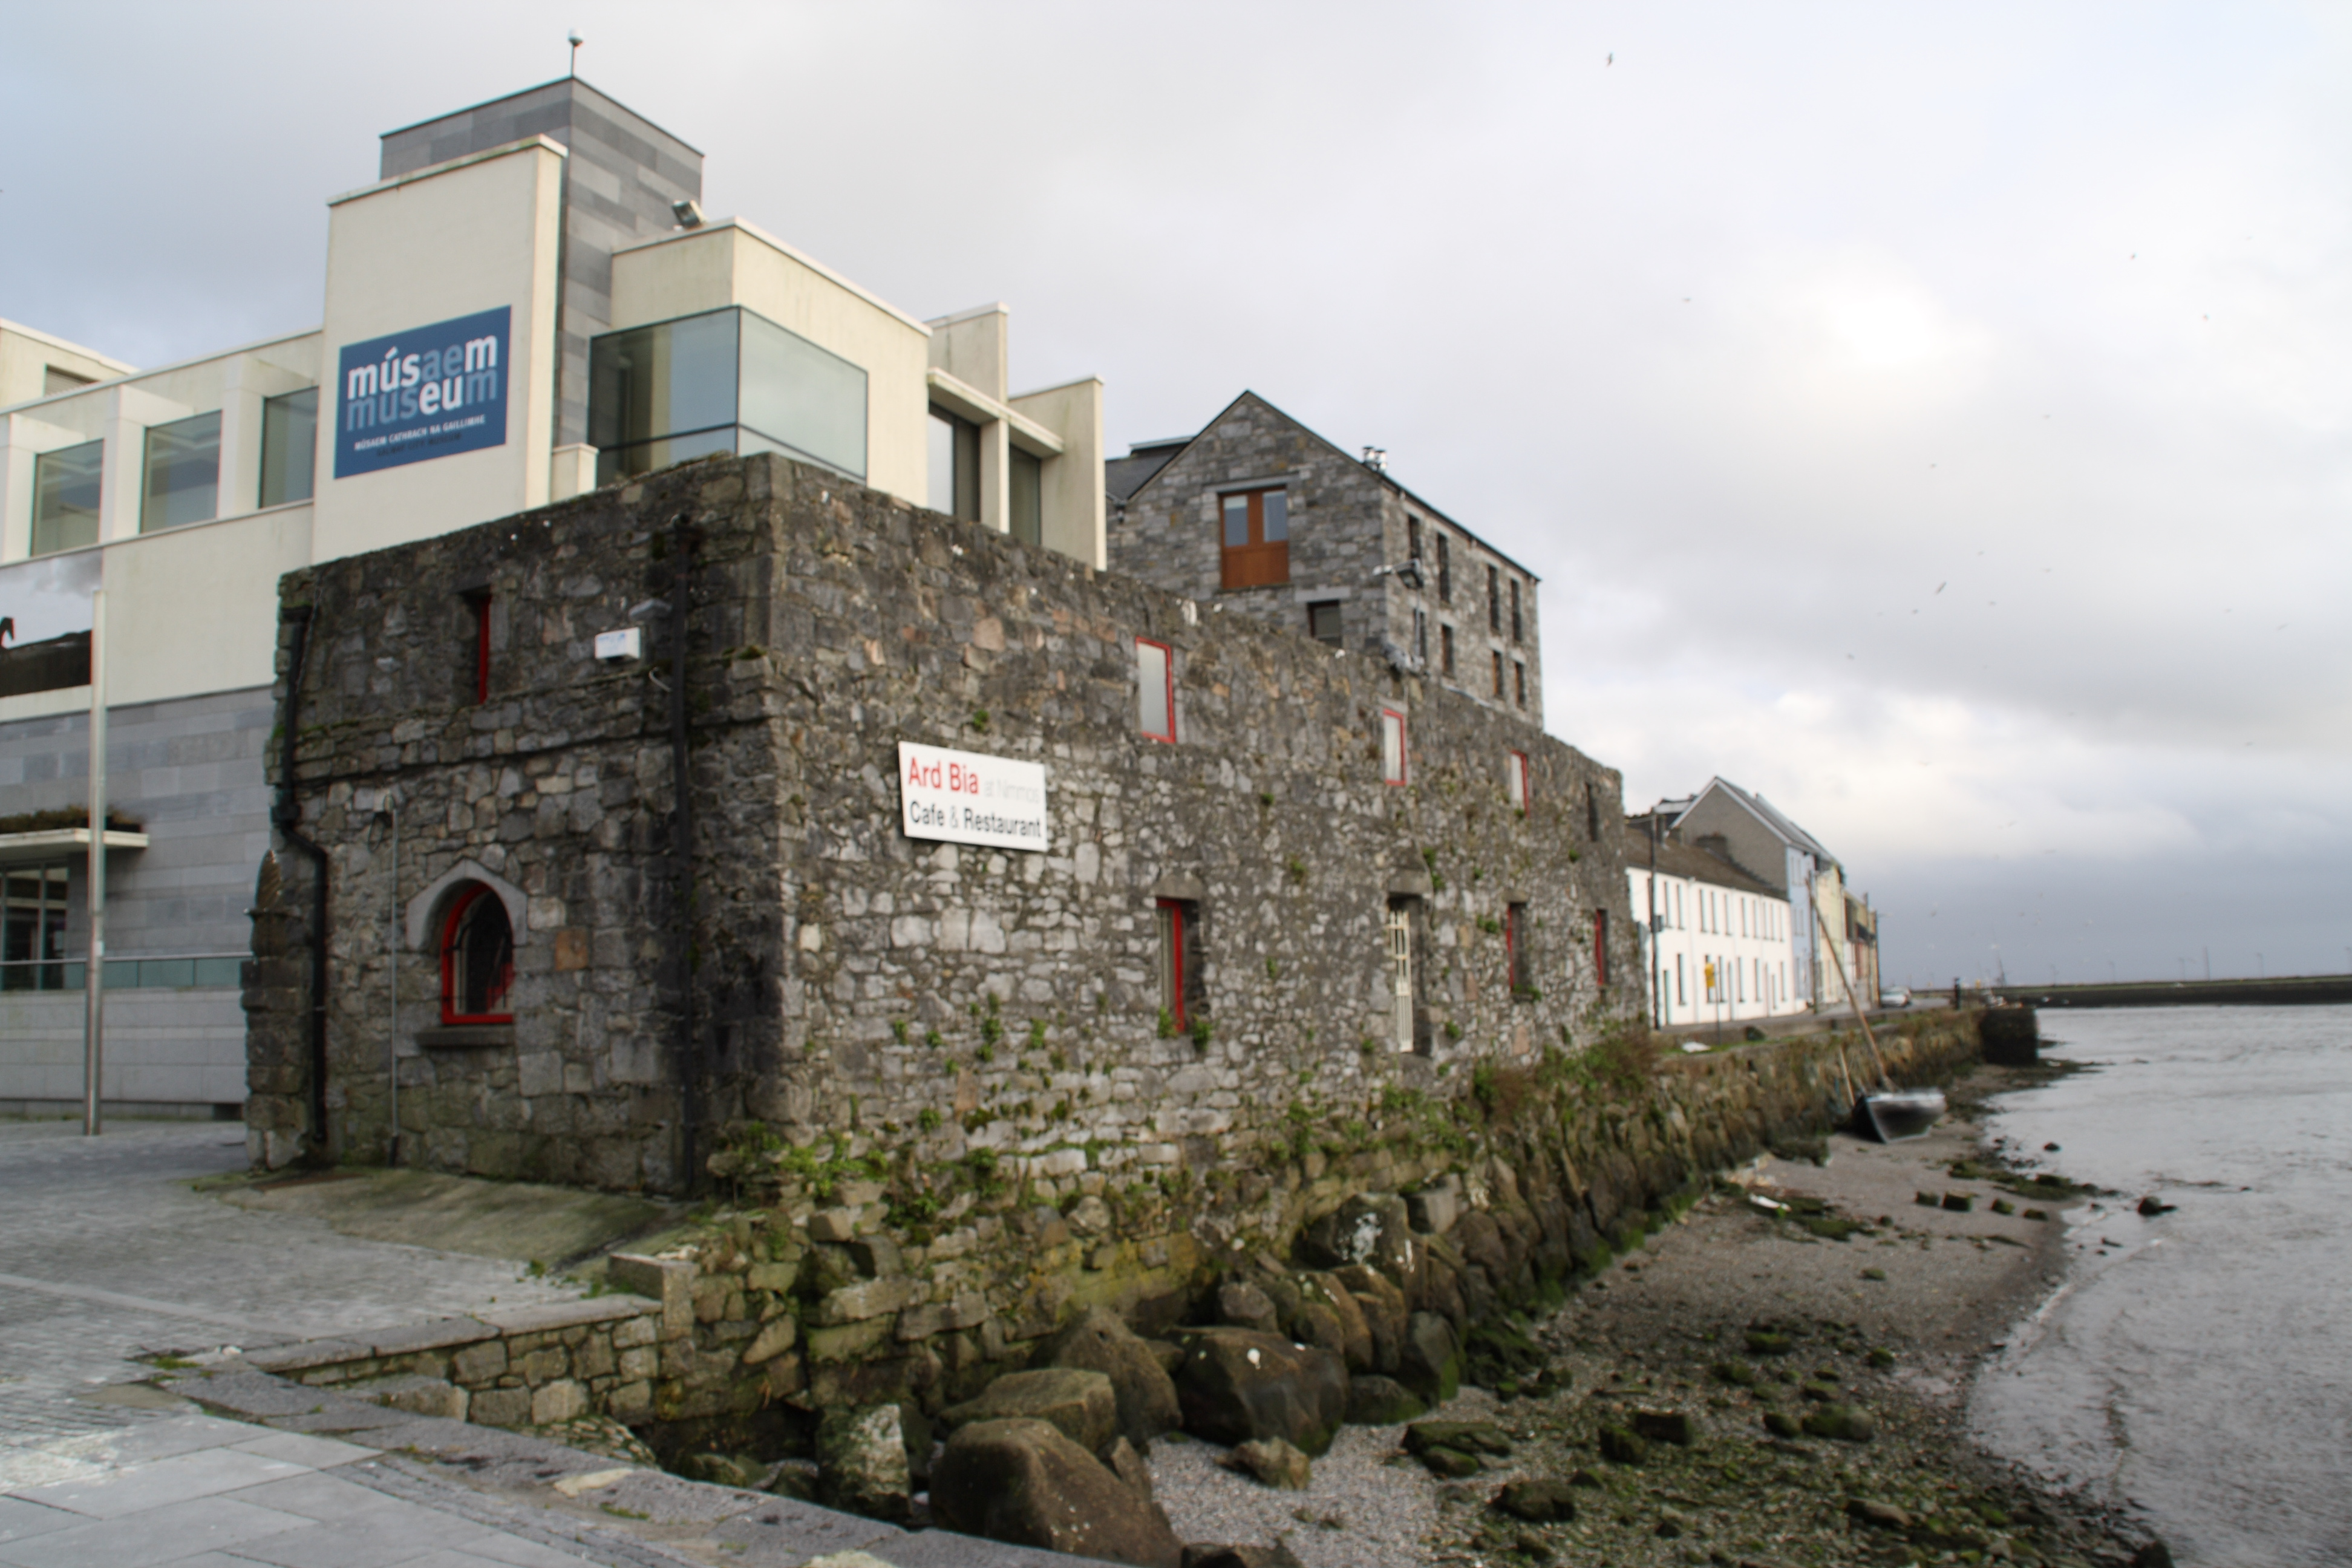 kurikku.co.uk Dating in Galway